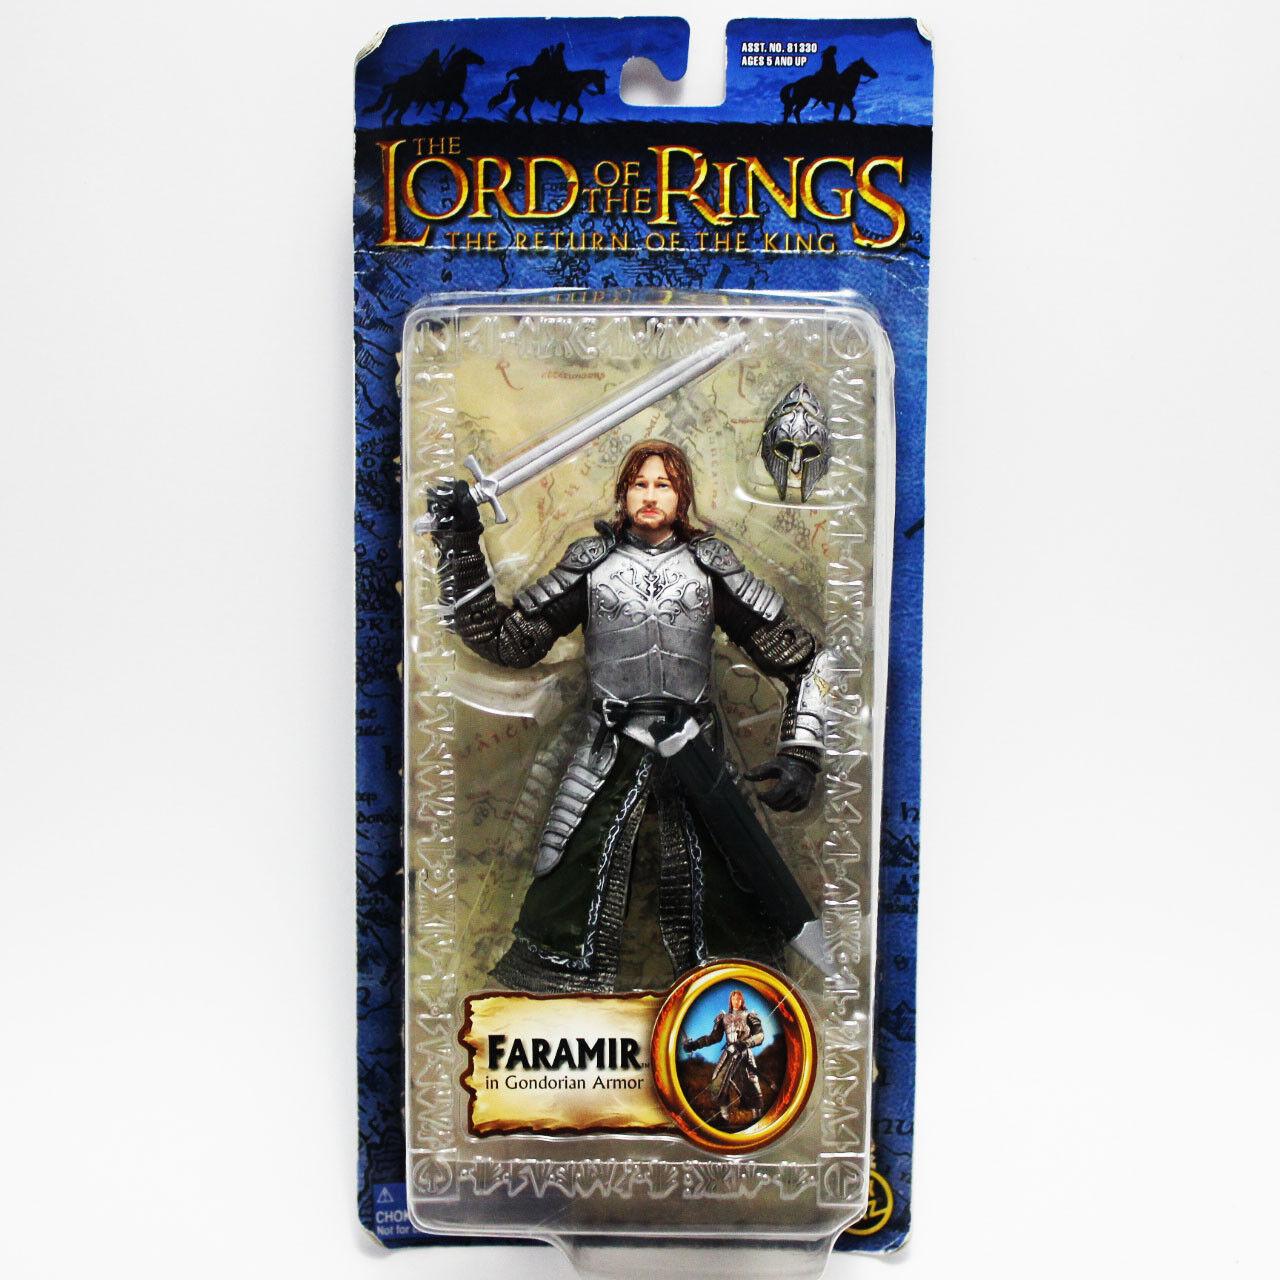 Toybiz Lord of the Rings Rings Rings The Return of the King Faramir in Gondorian Armor NEW 1b92ef